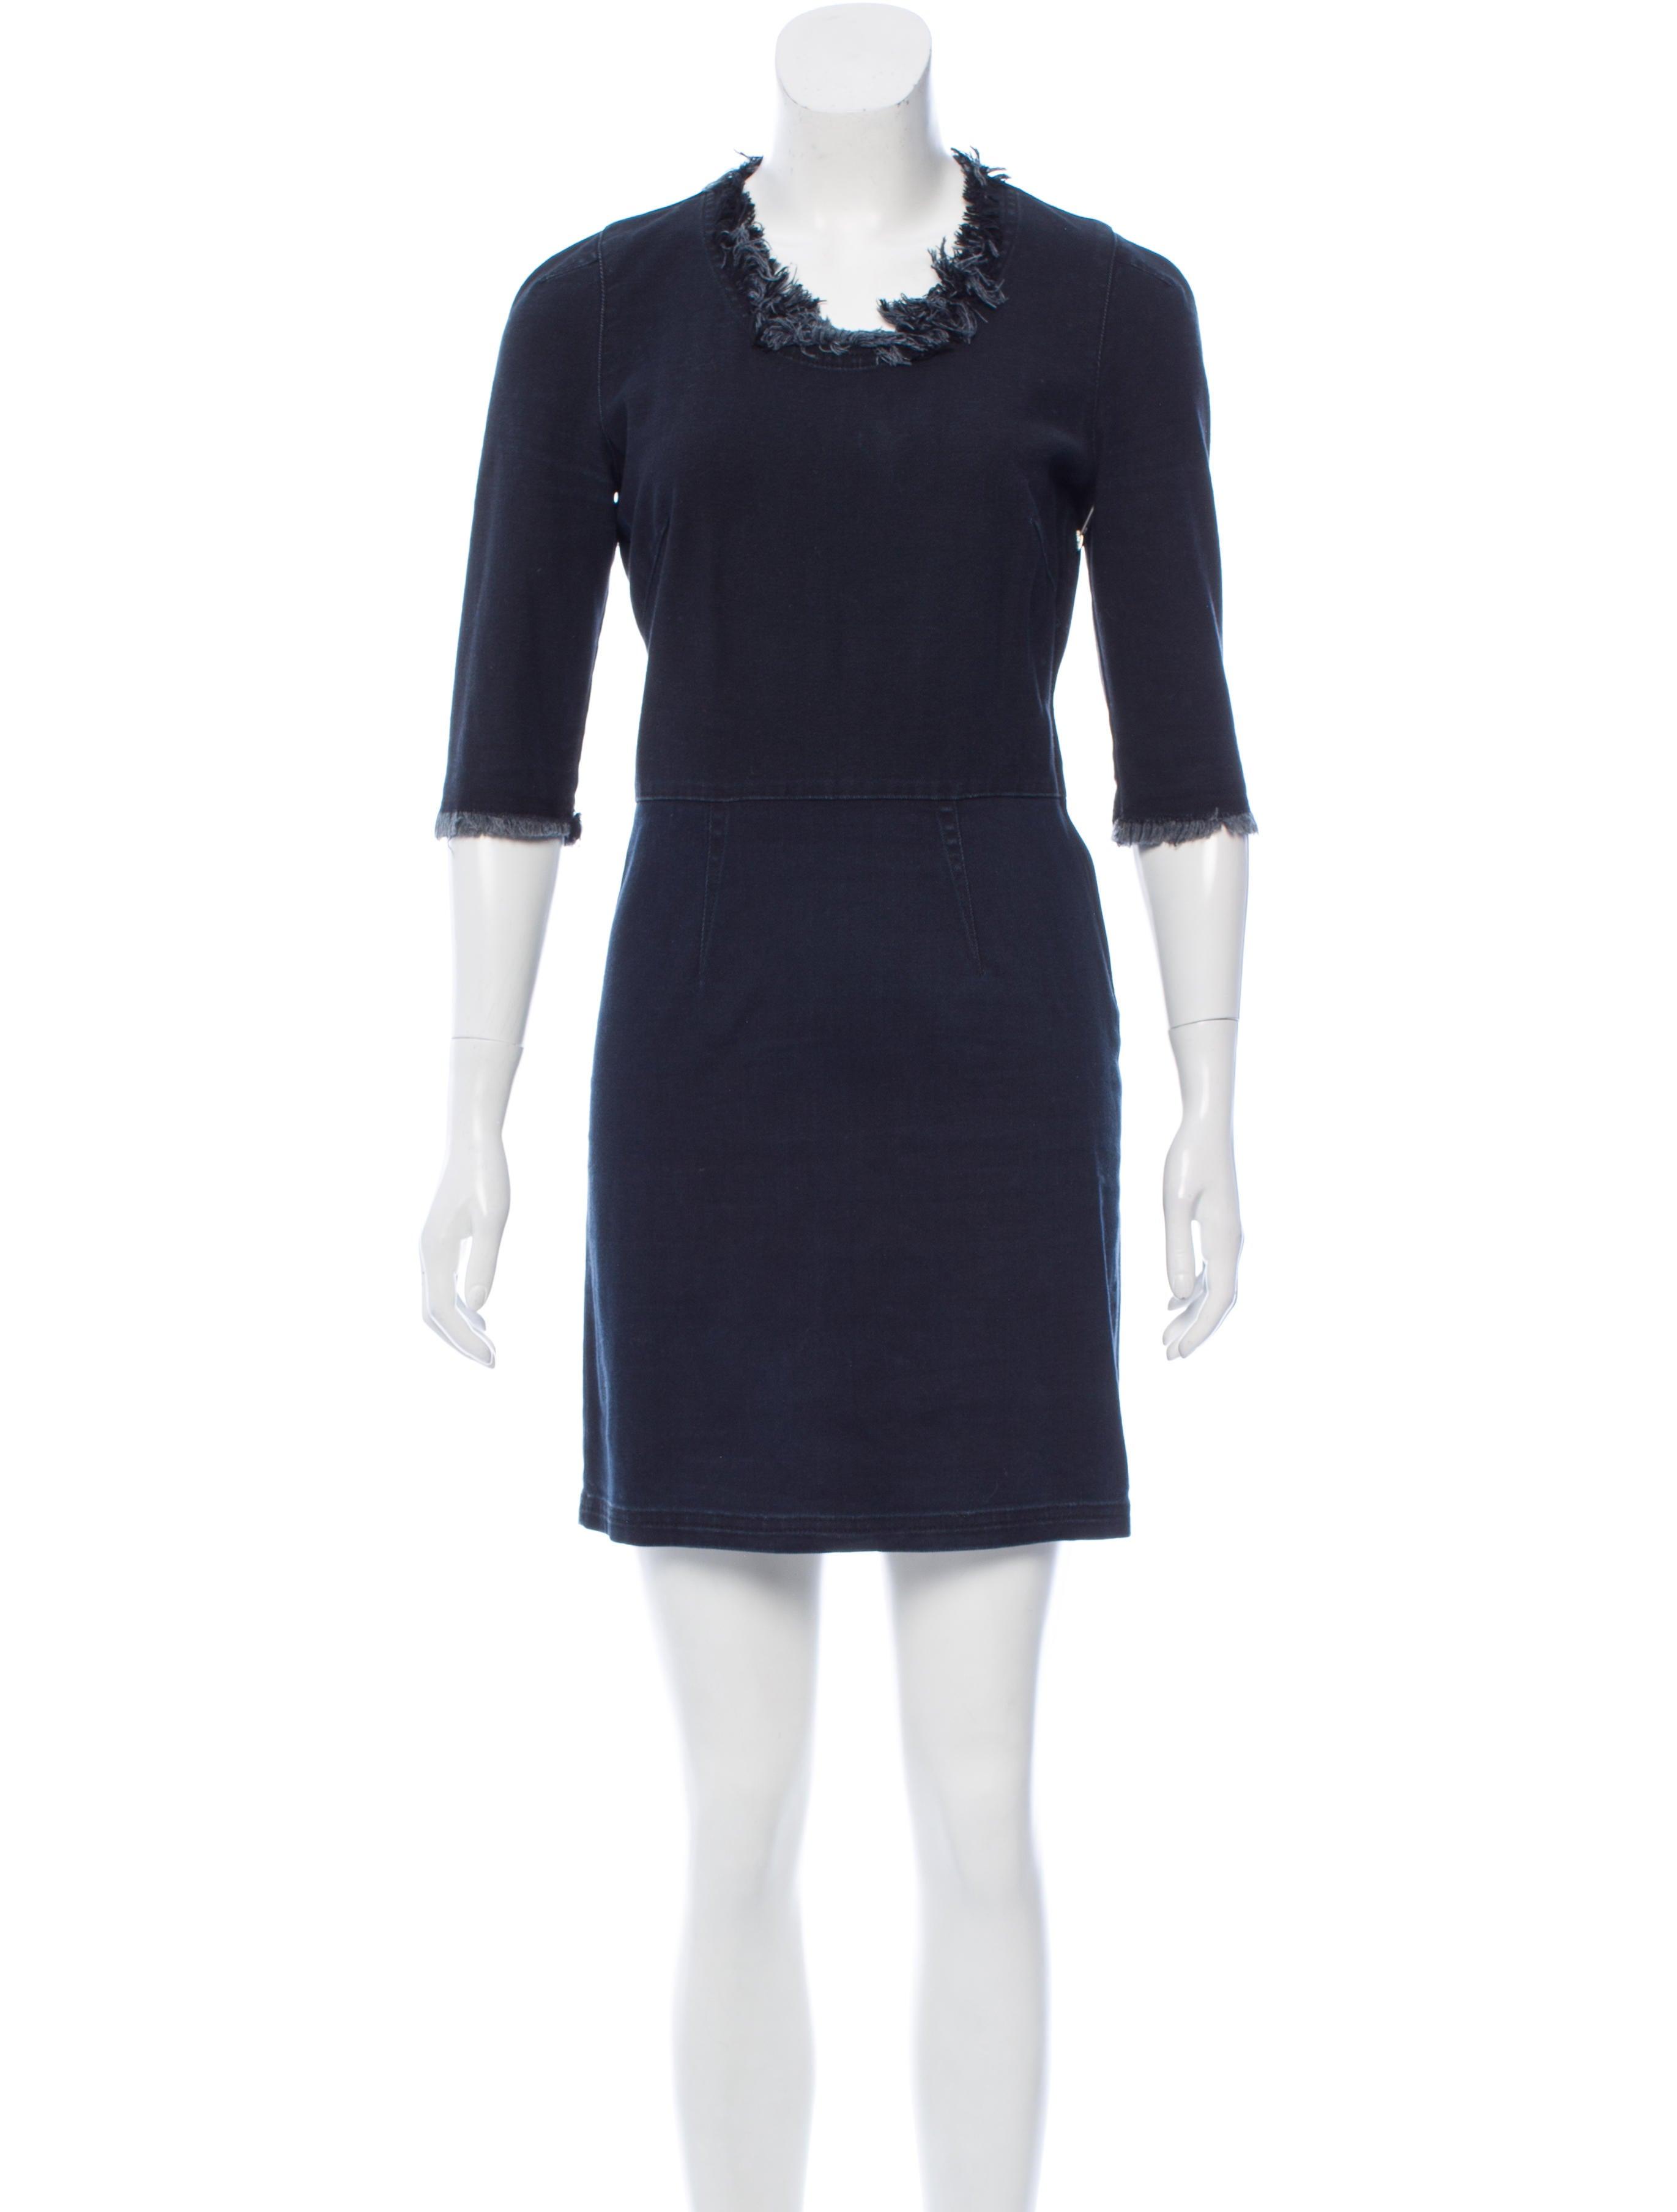 Toile isabel marant denim mini dress clothing for Isabel marant shirt dress